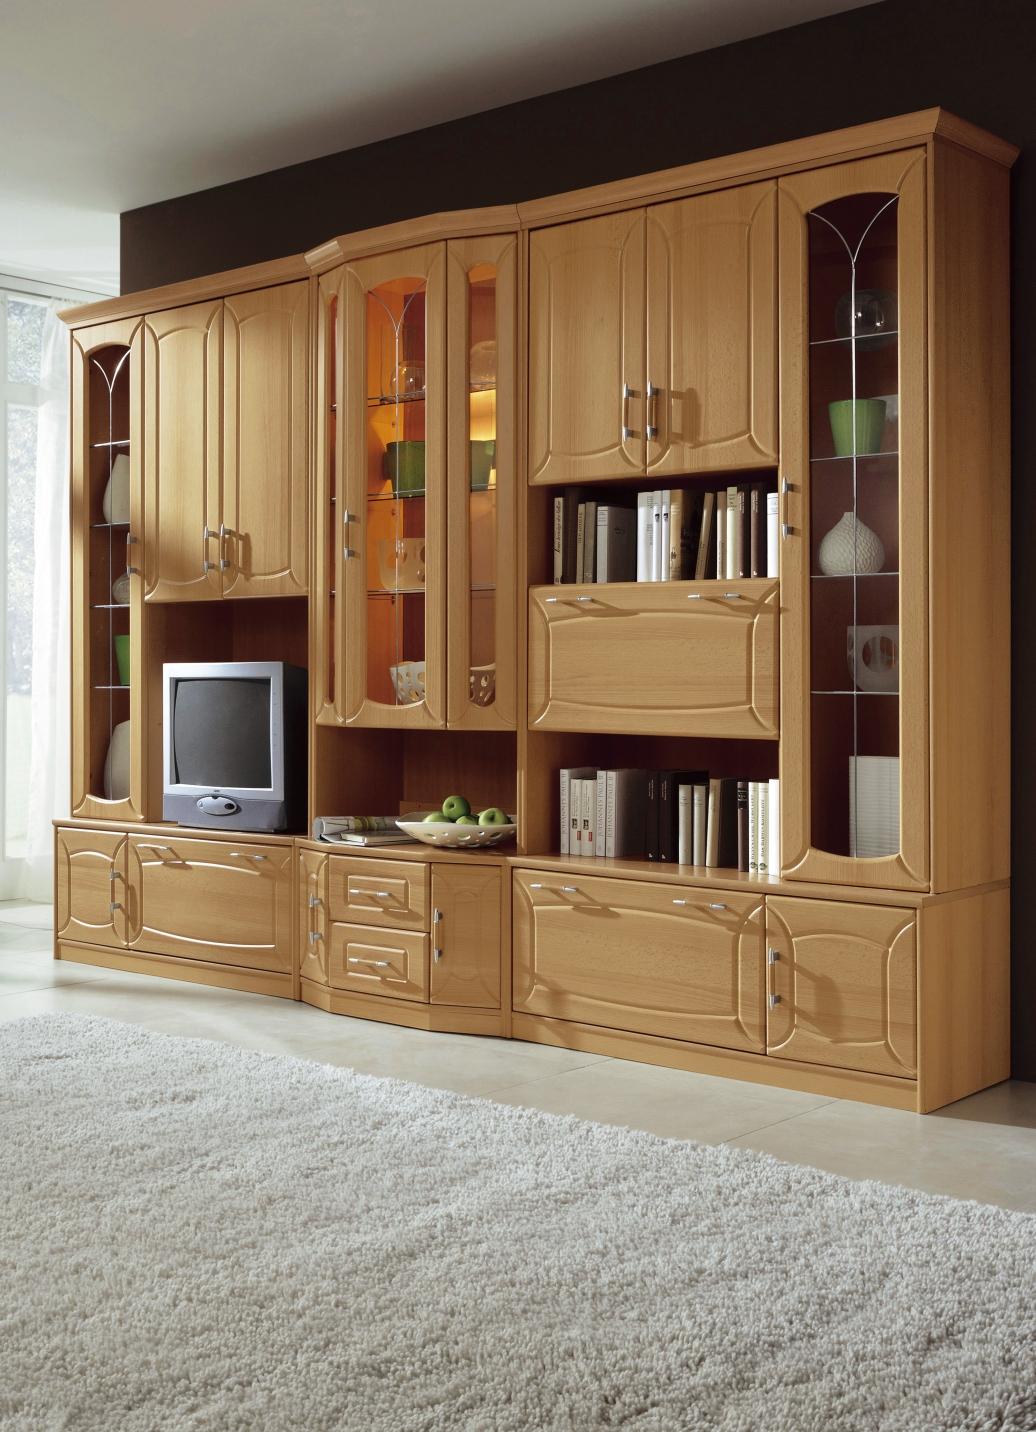 klassische wohnwand mit front in buchedekor klassische. Black Bedroom Furniture Sets. Home Design Ideas